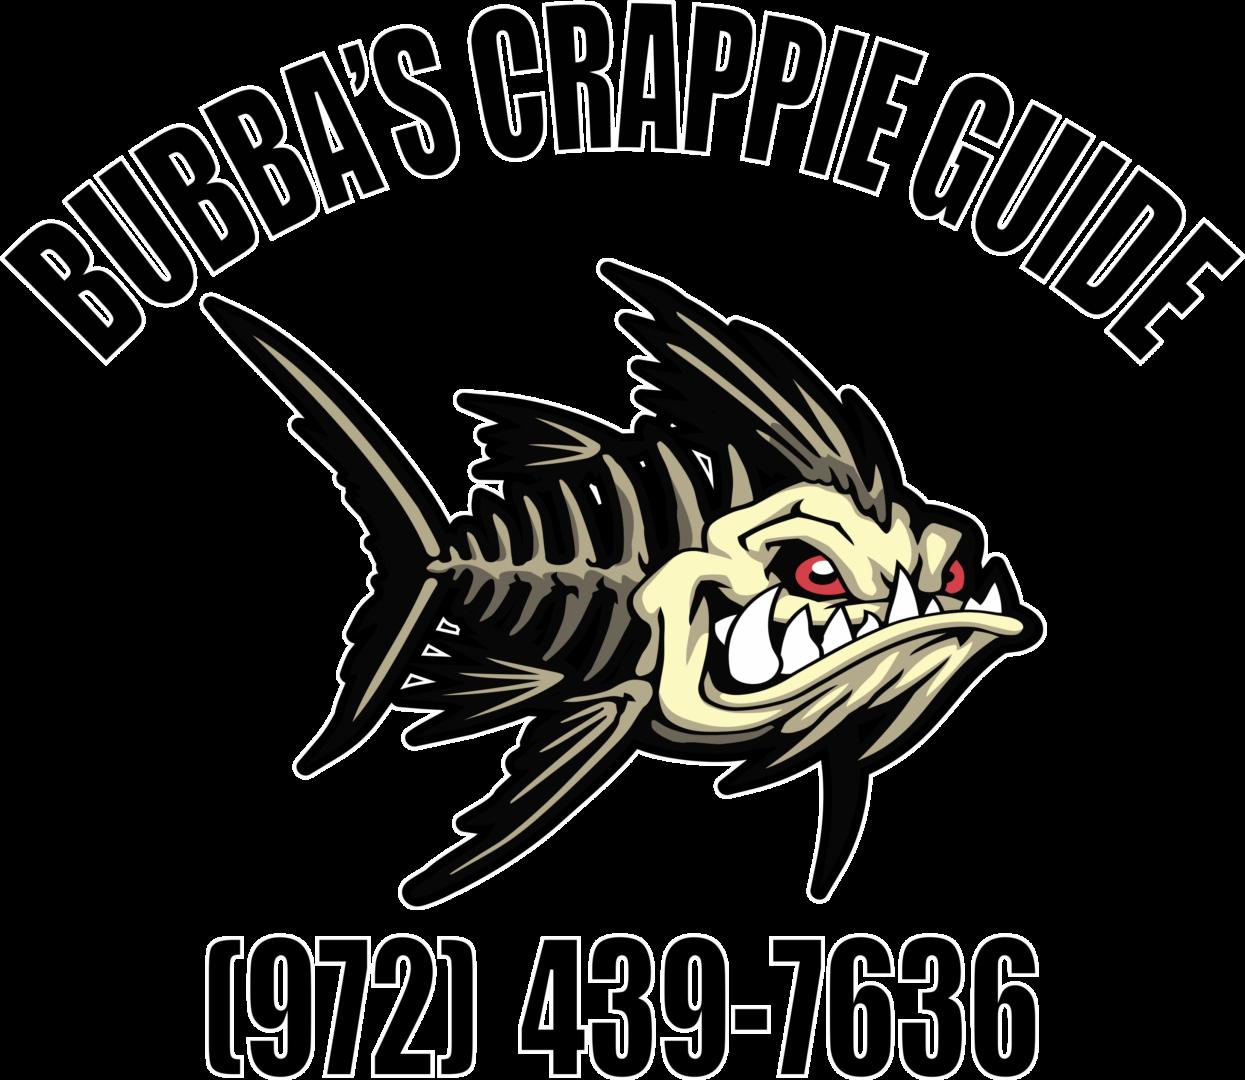 Bubbs Crappie Guide Logo